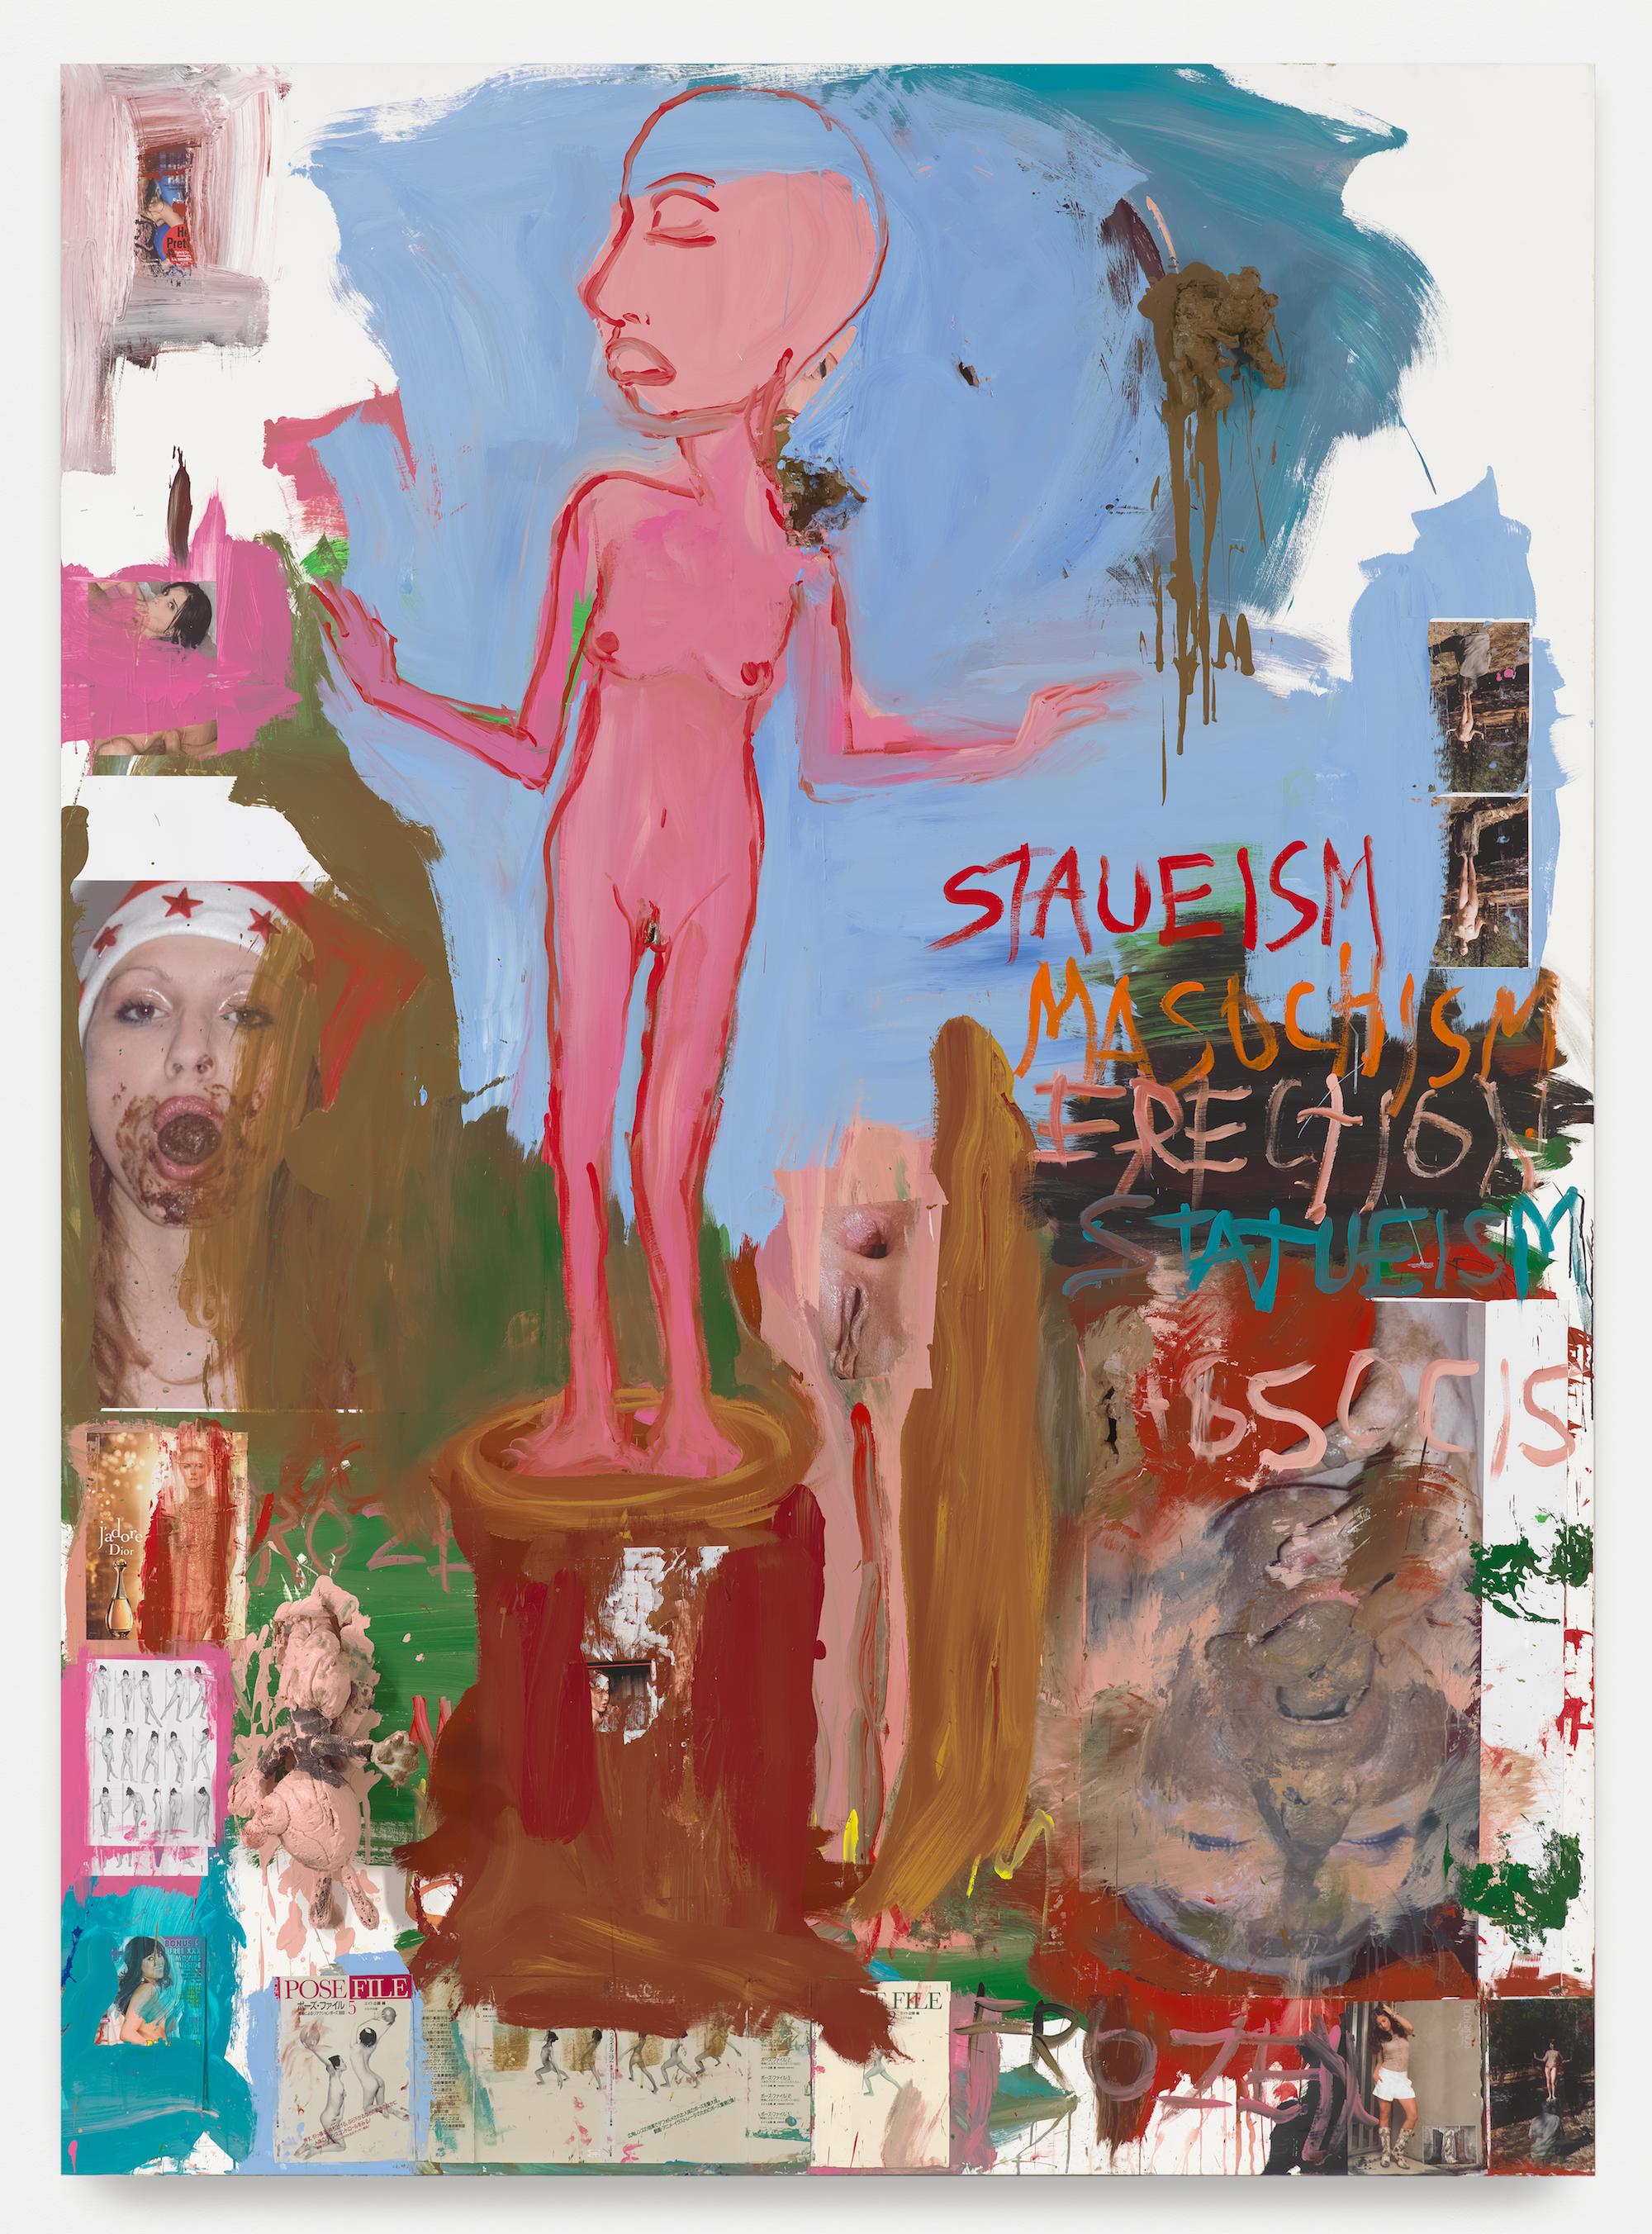 Paul McCarthy, WS, Staueism, Masochism, Erection, Statueism, Frozen, Pose File, Spiritual Philosophy, 2014